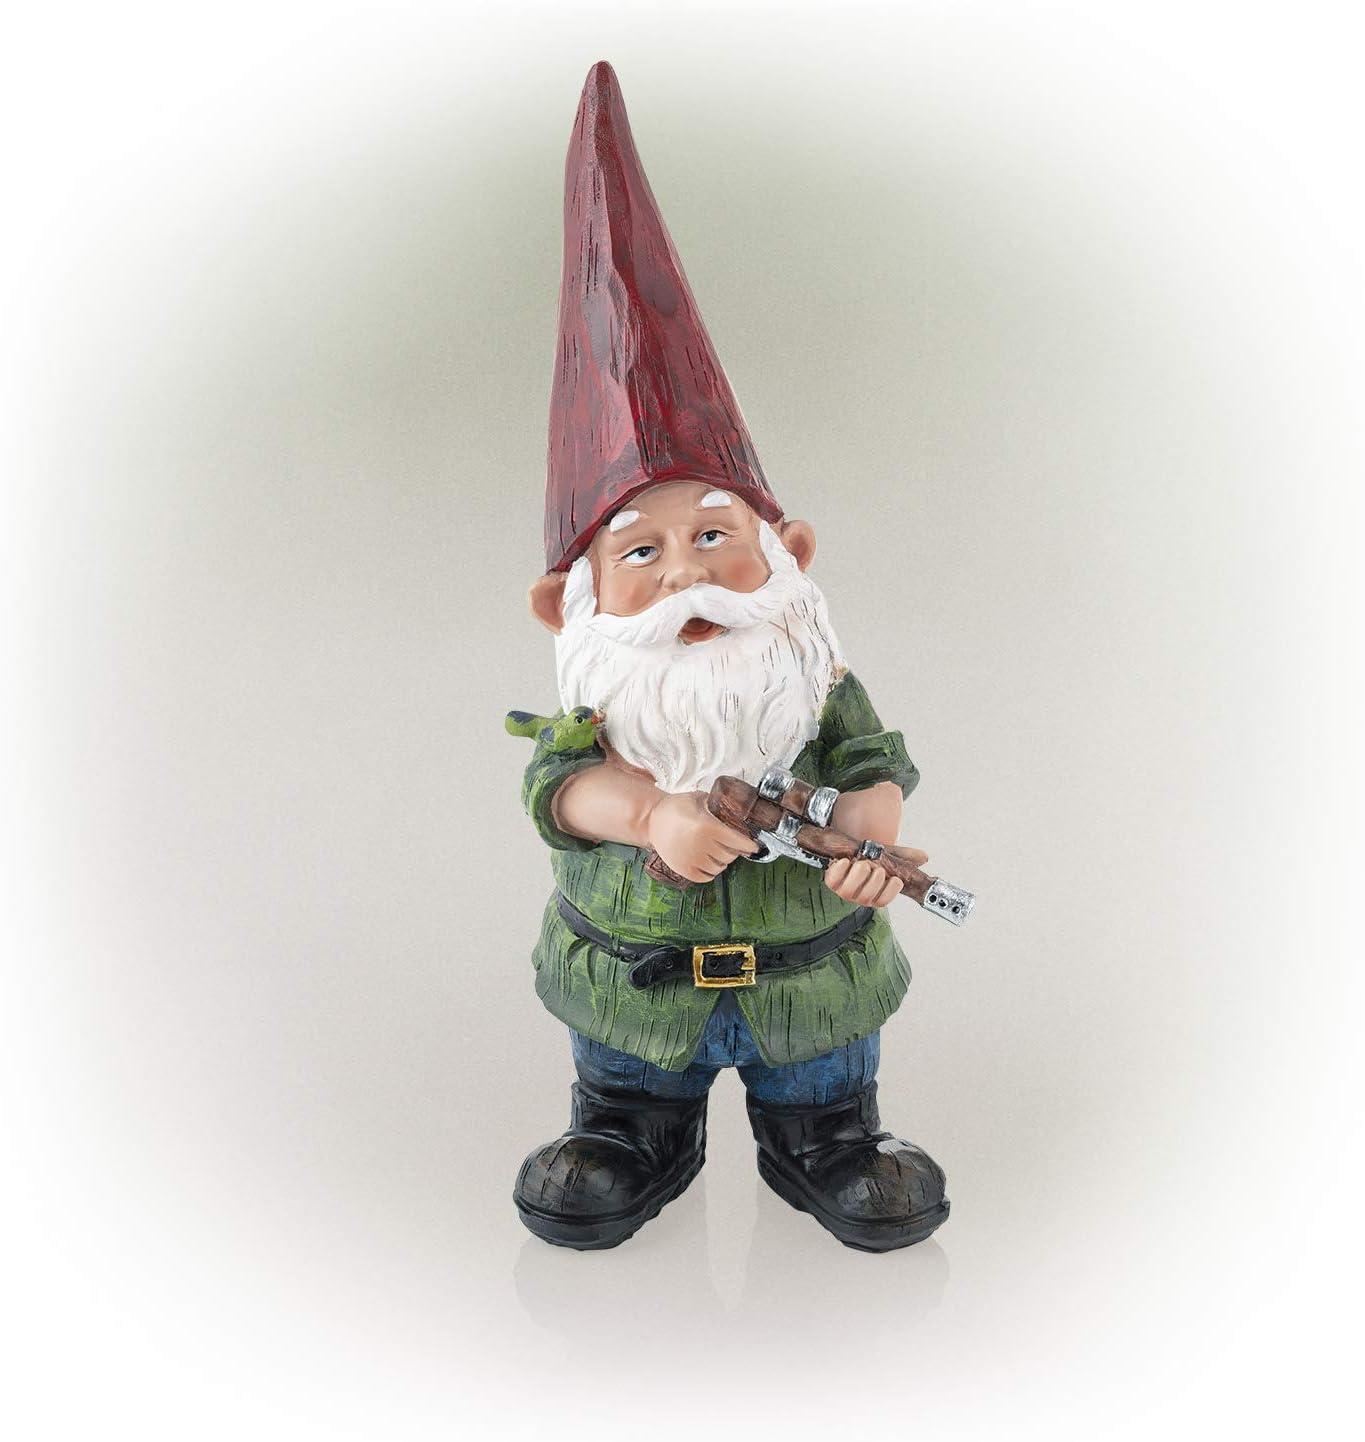 Alpine Corporation GDS124 Alpine Hunting Green Shirt Garden Gnome Outdoor Statue, Multicolor